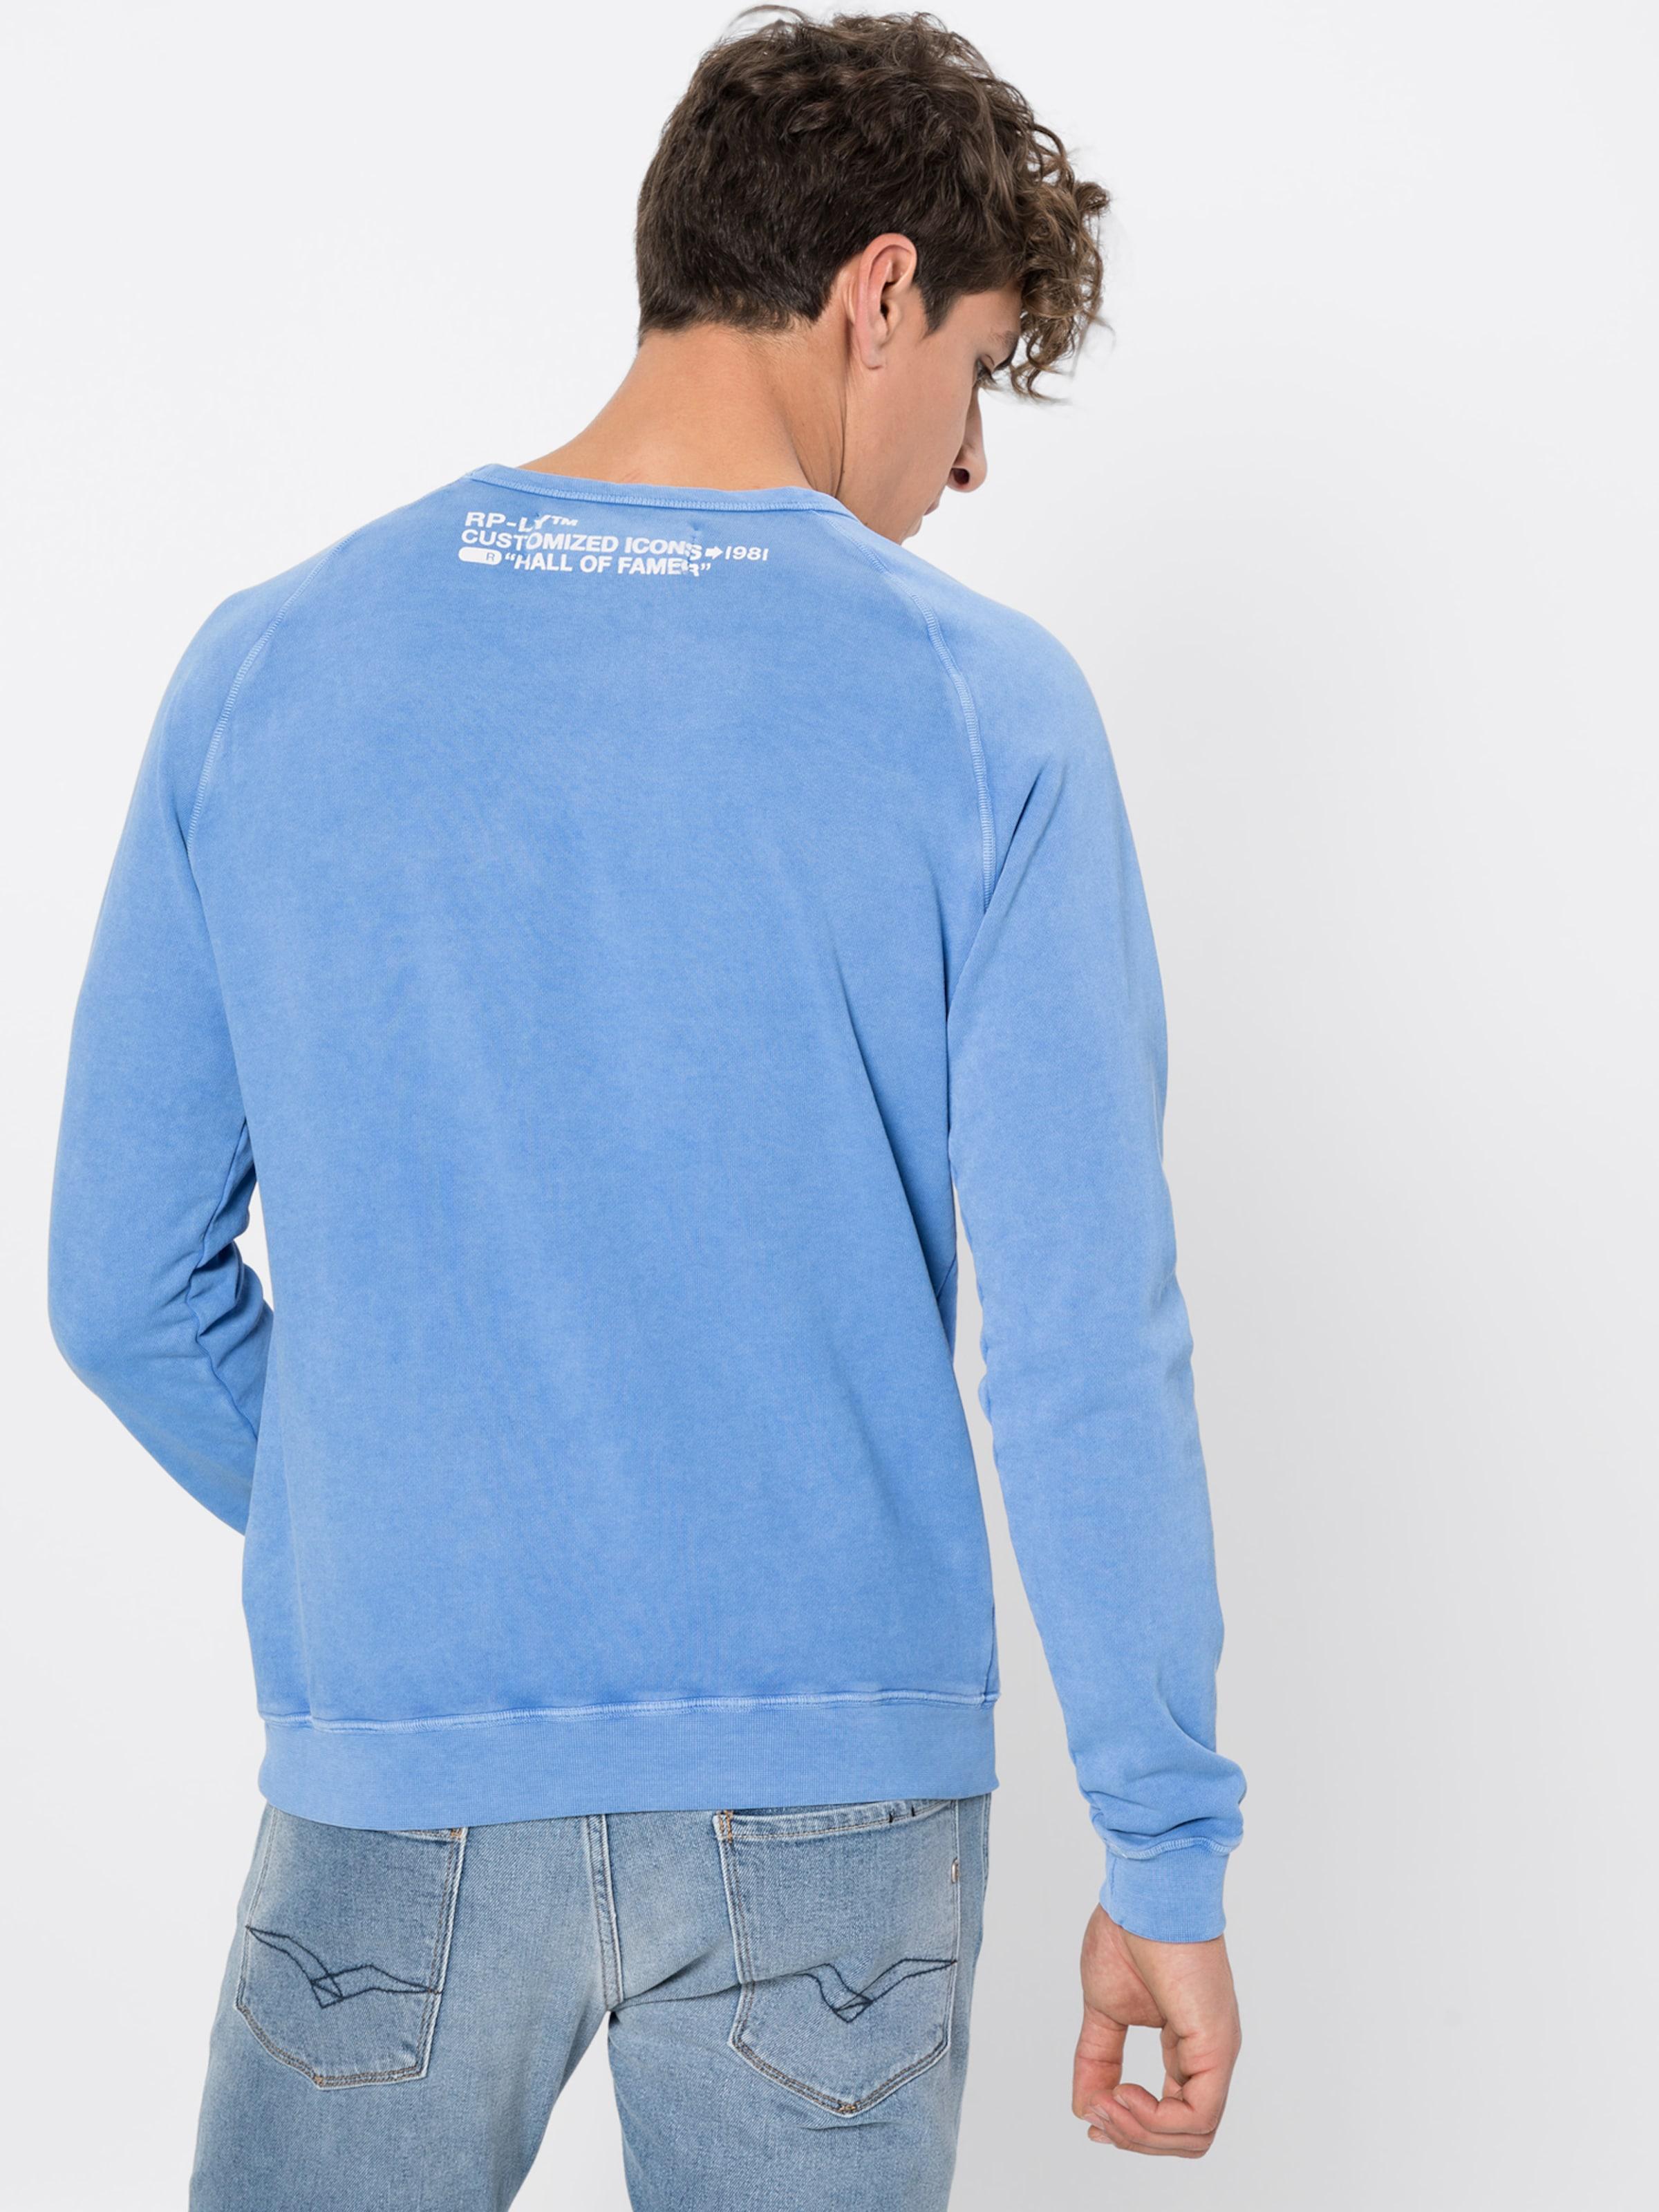 Shirt Bleu En Sweat Replay Wiutlkoxzp bfgyY76v